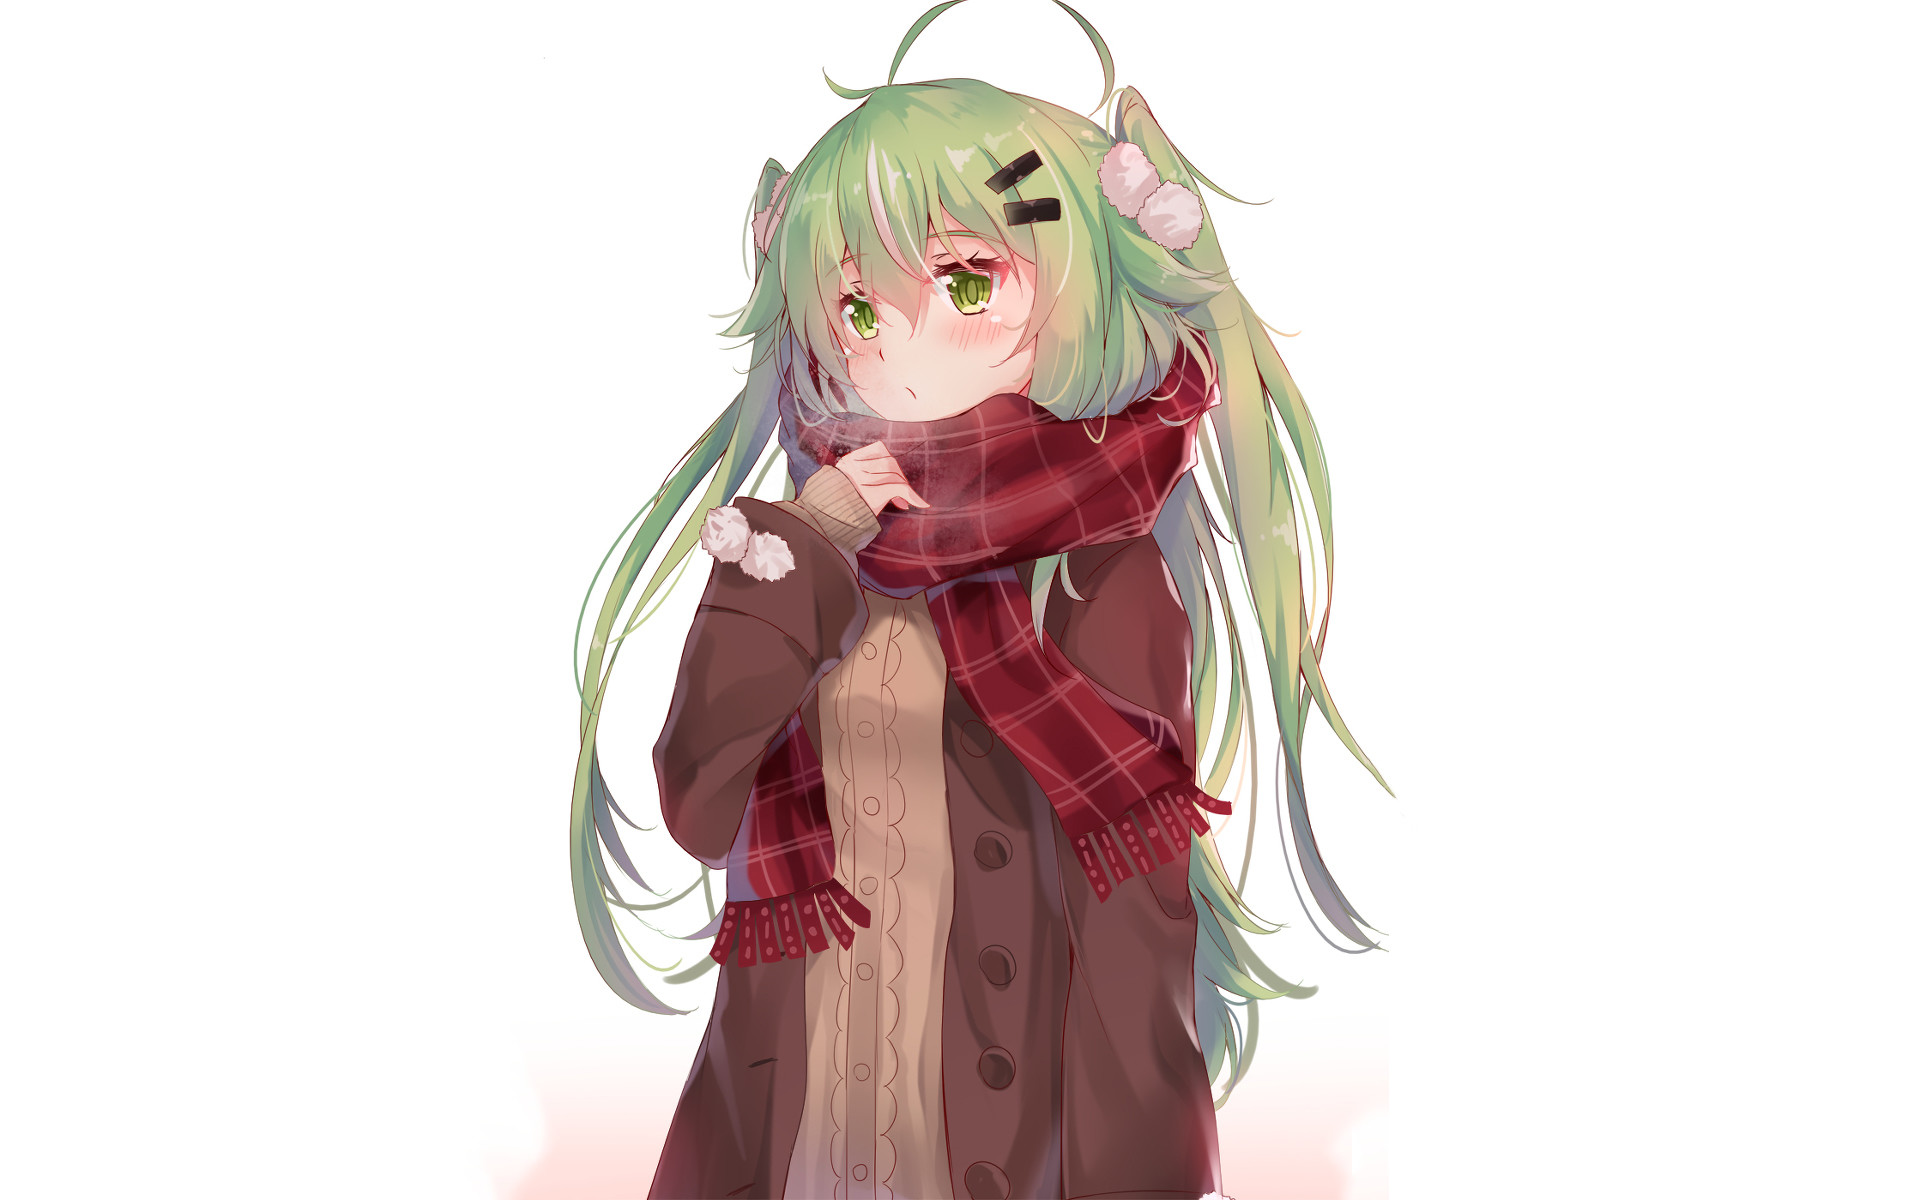 Desktop Wallpaper Cute Anime Girl, Green Hair, Minimal, Hd Image